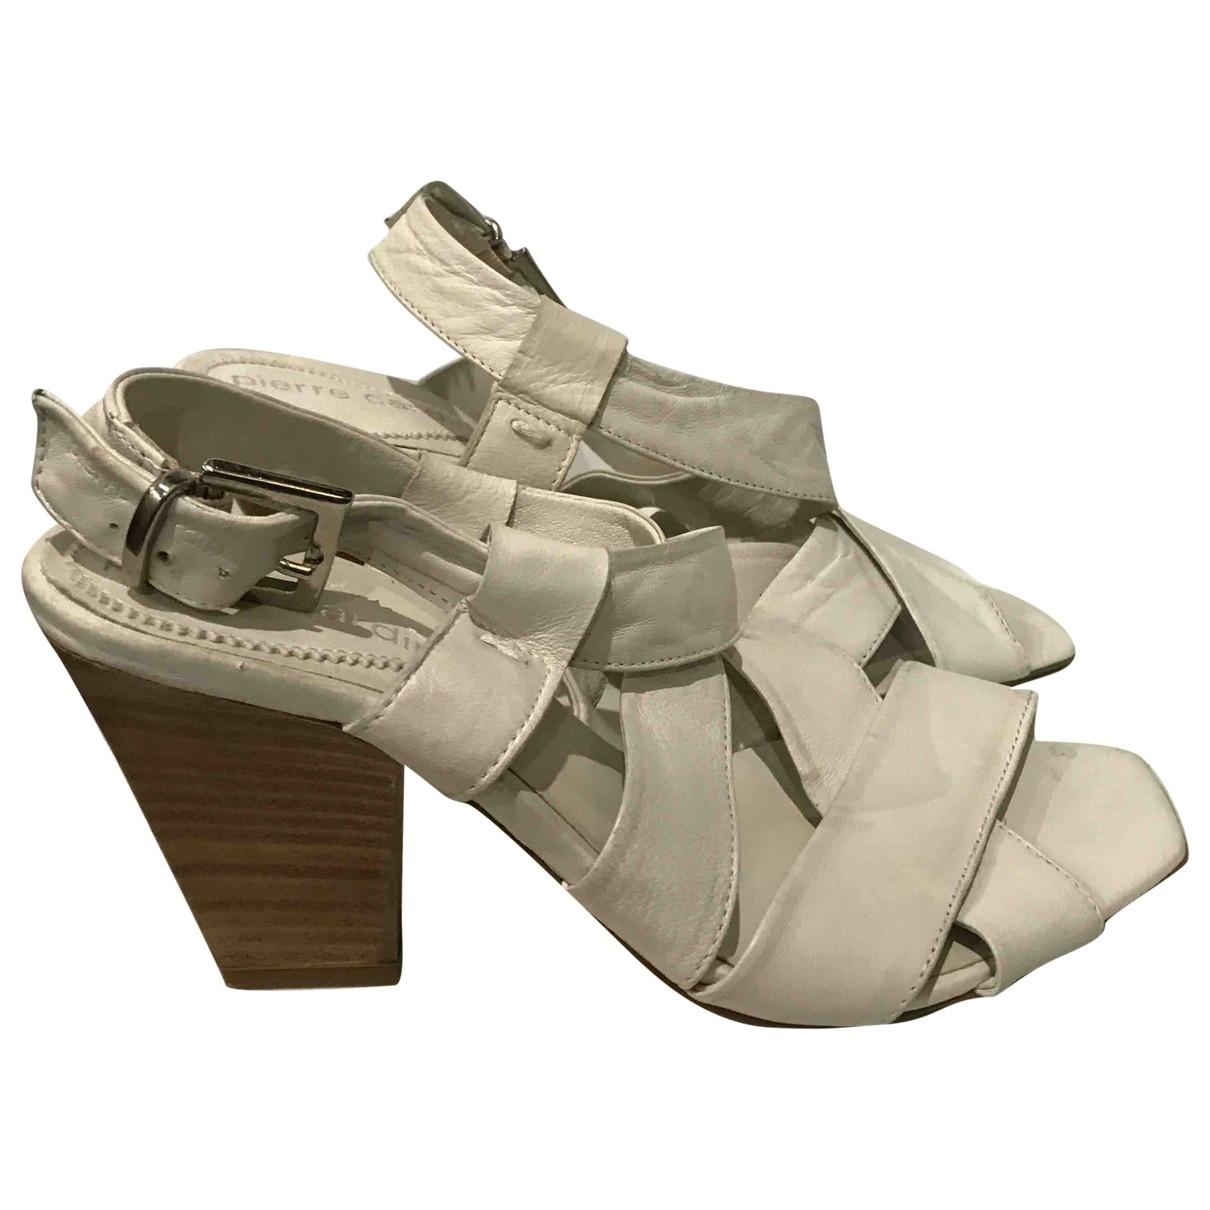 Pierre Cardin - Sandales   pour femme en cuir - beige